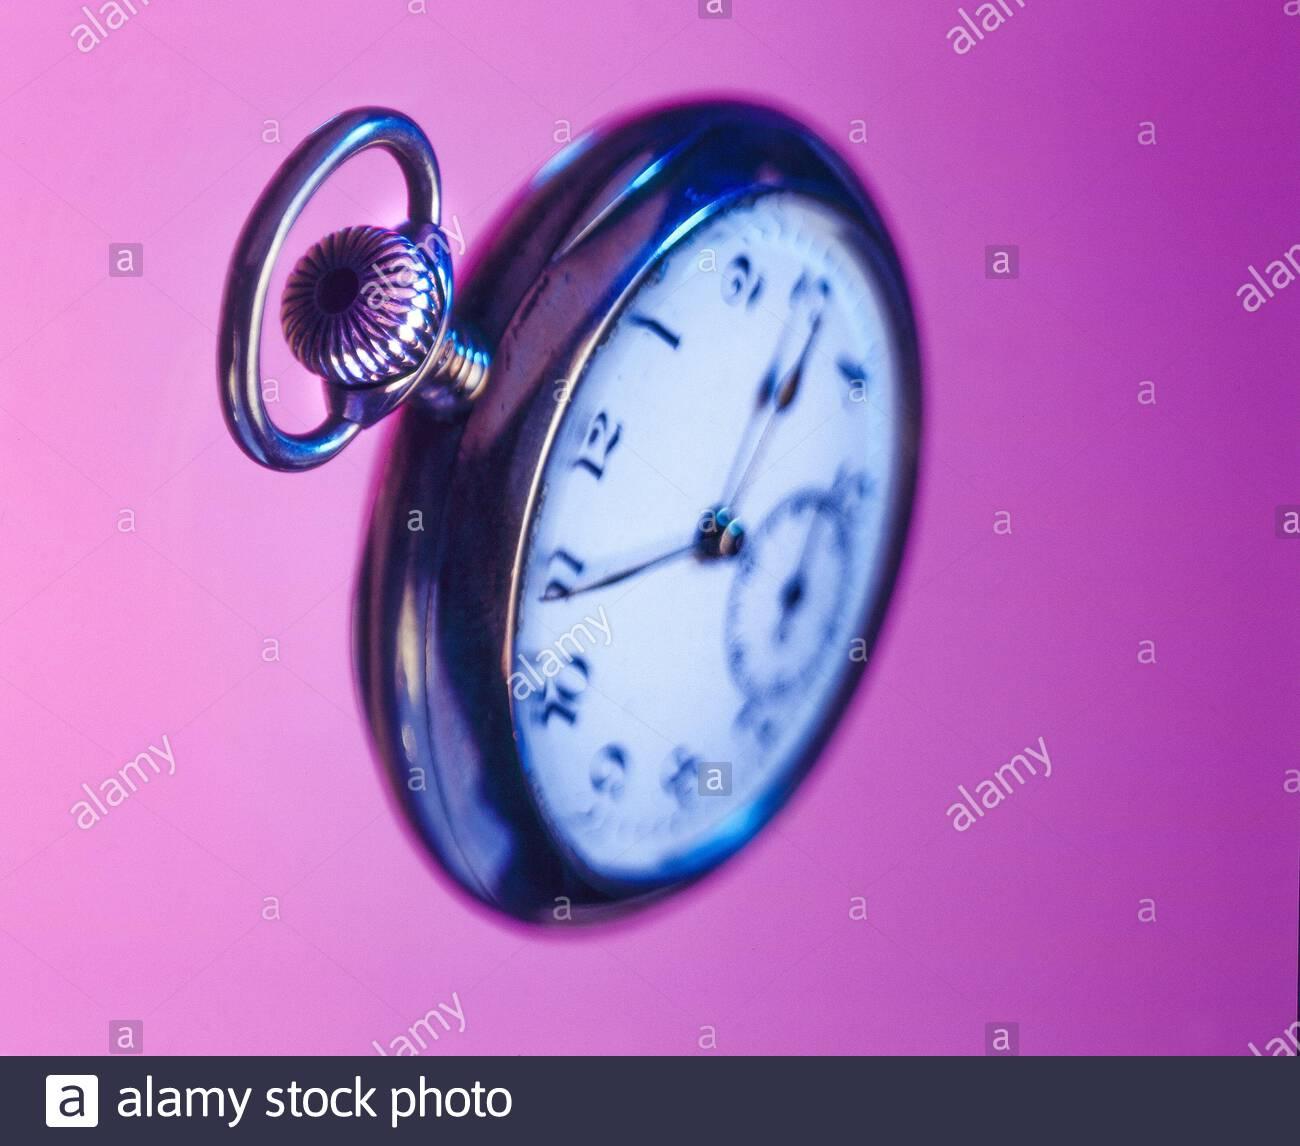 Old pocket watch, artist's impression Stock Photo